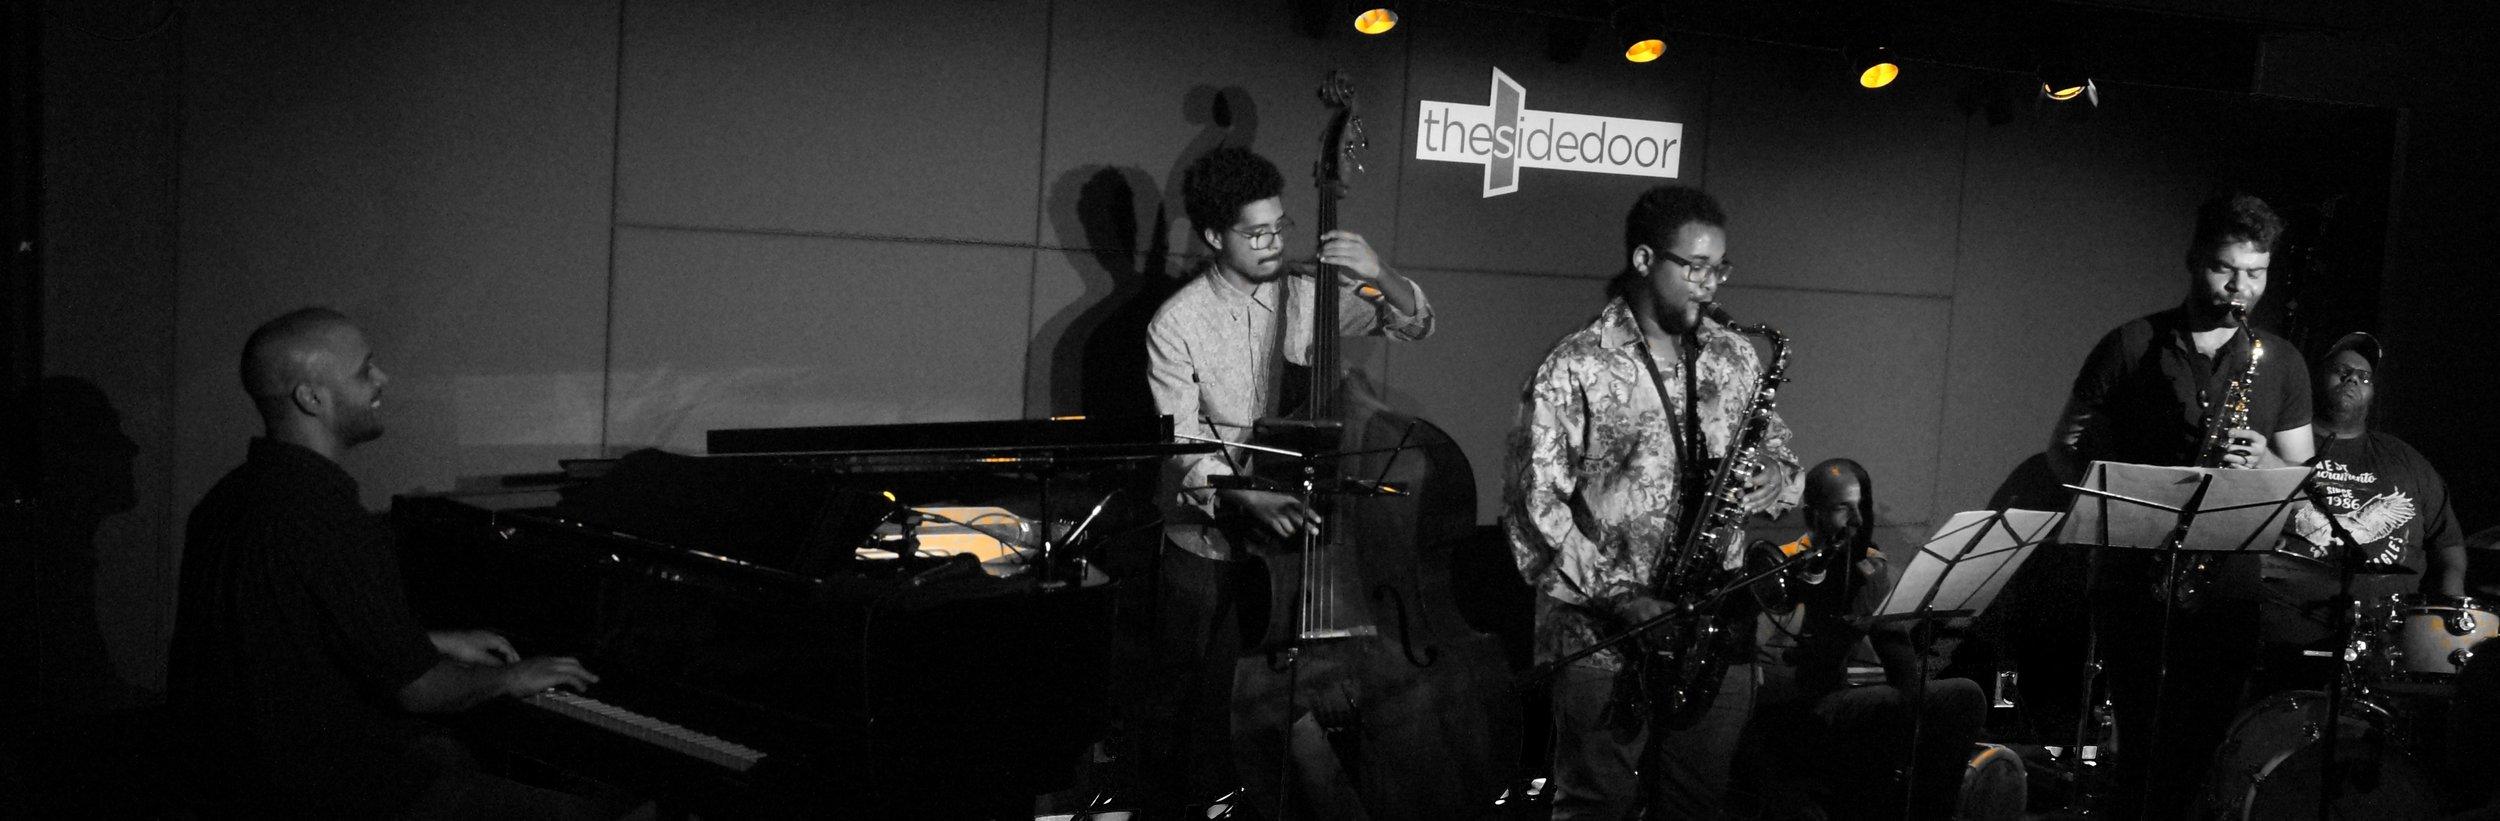 Josean Jacobo & Tumbao at the Side Door Jazz Club in Connecticut